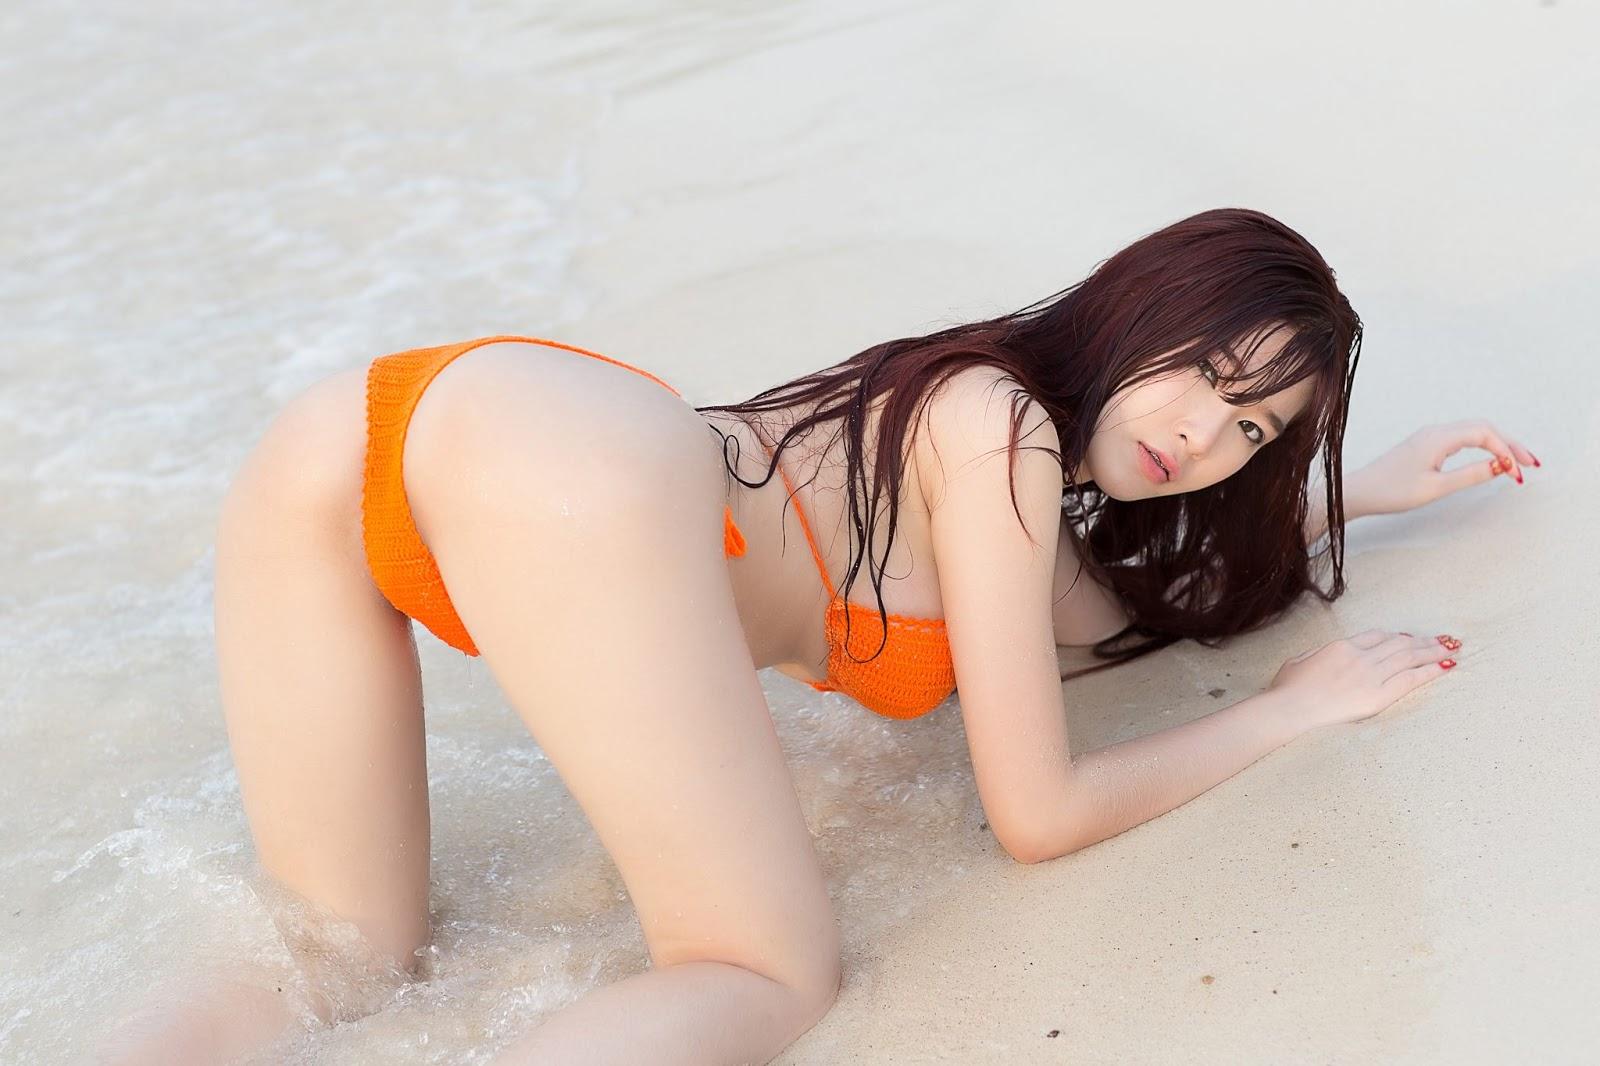 Thailand Model Sukanay Konin Part 6 On The Beach (60 Pict)